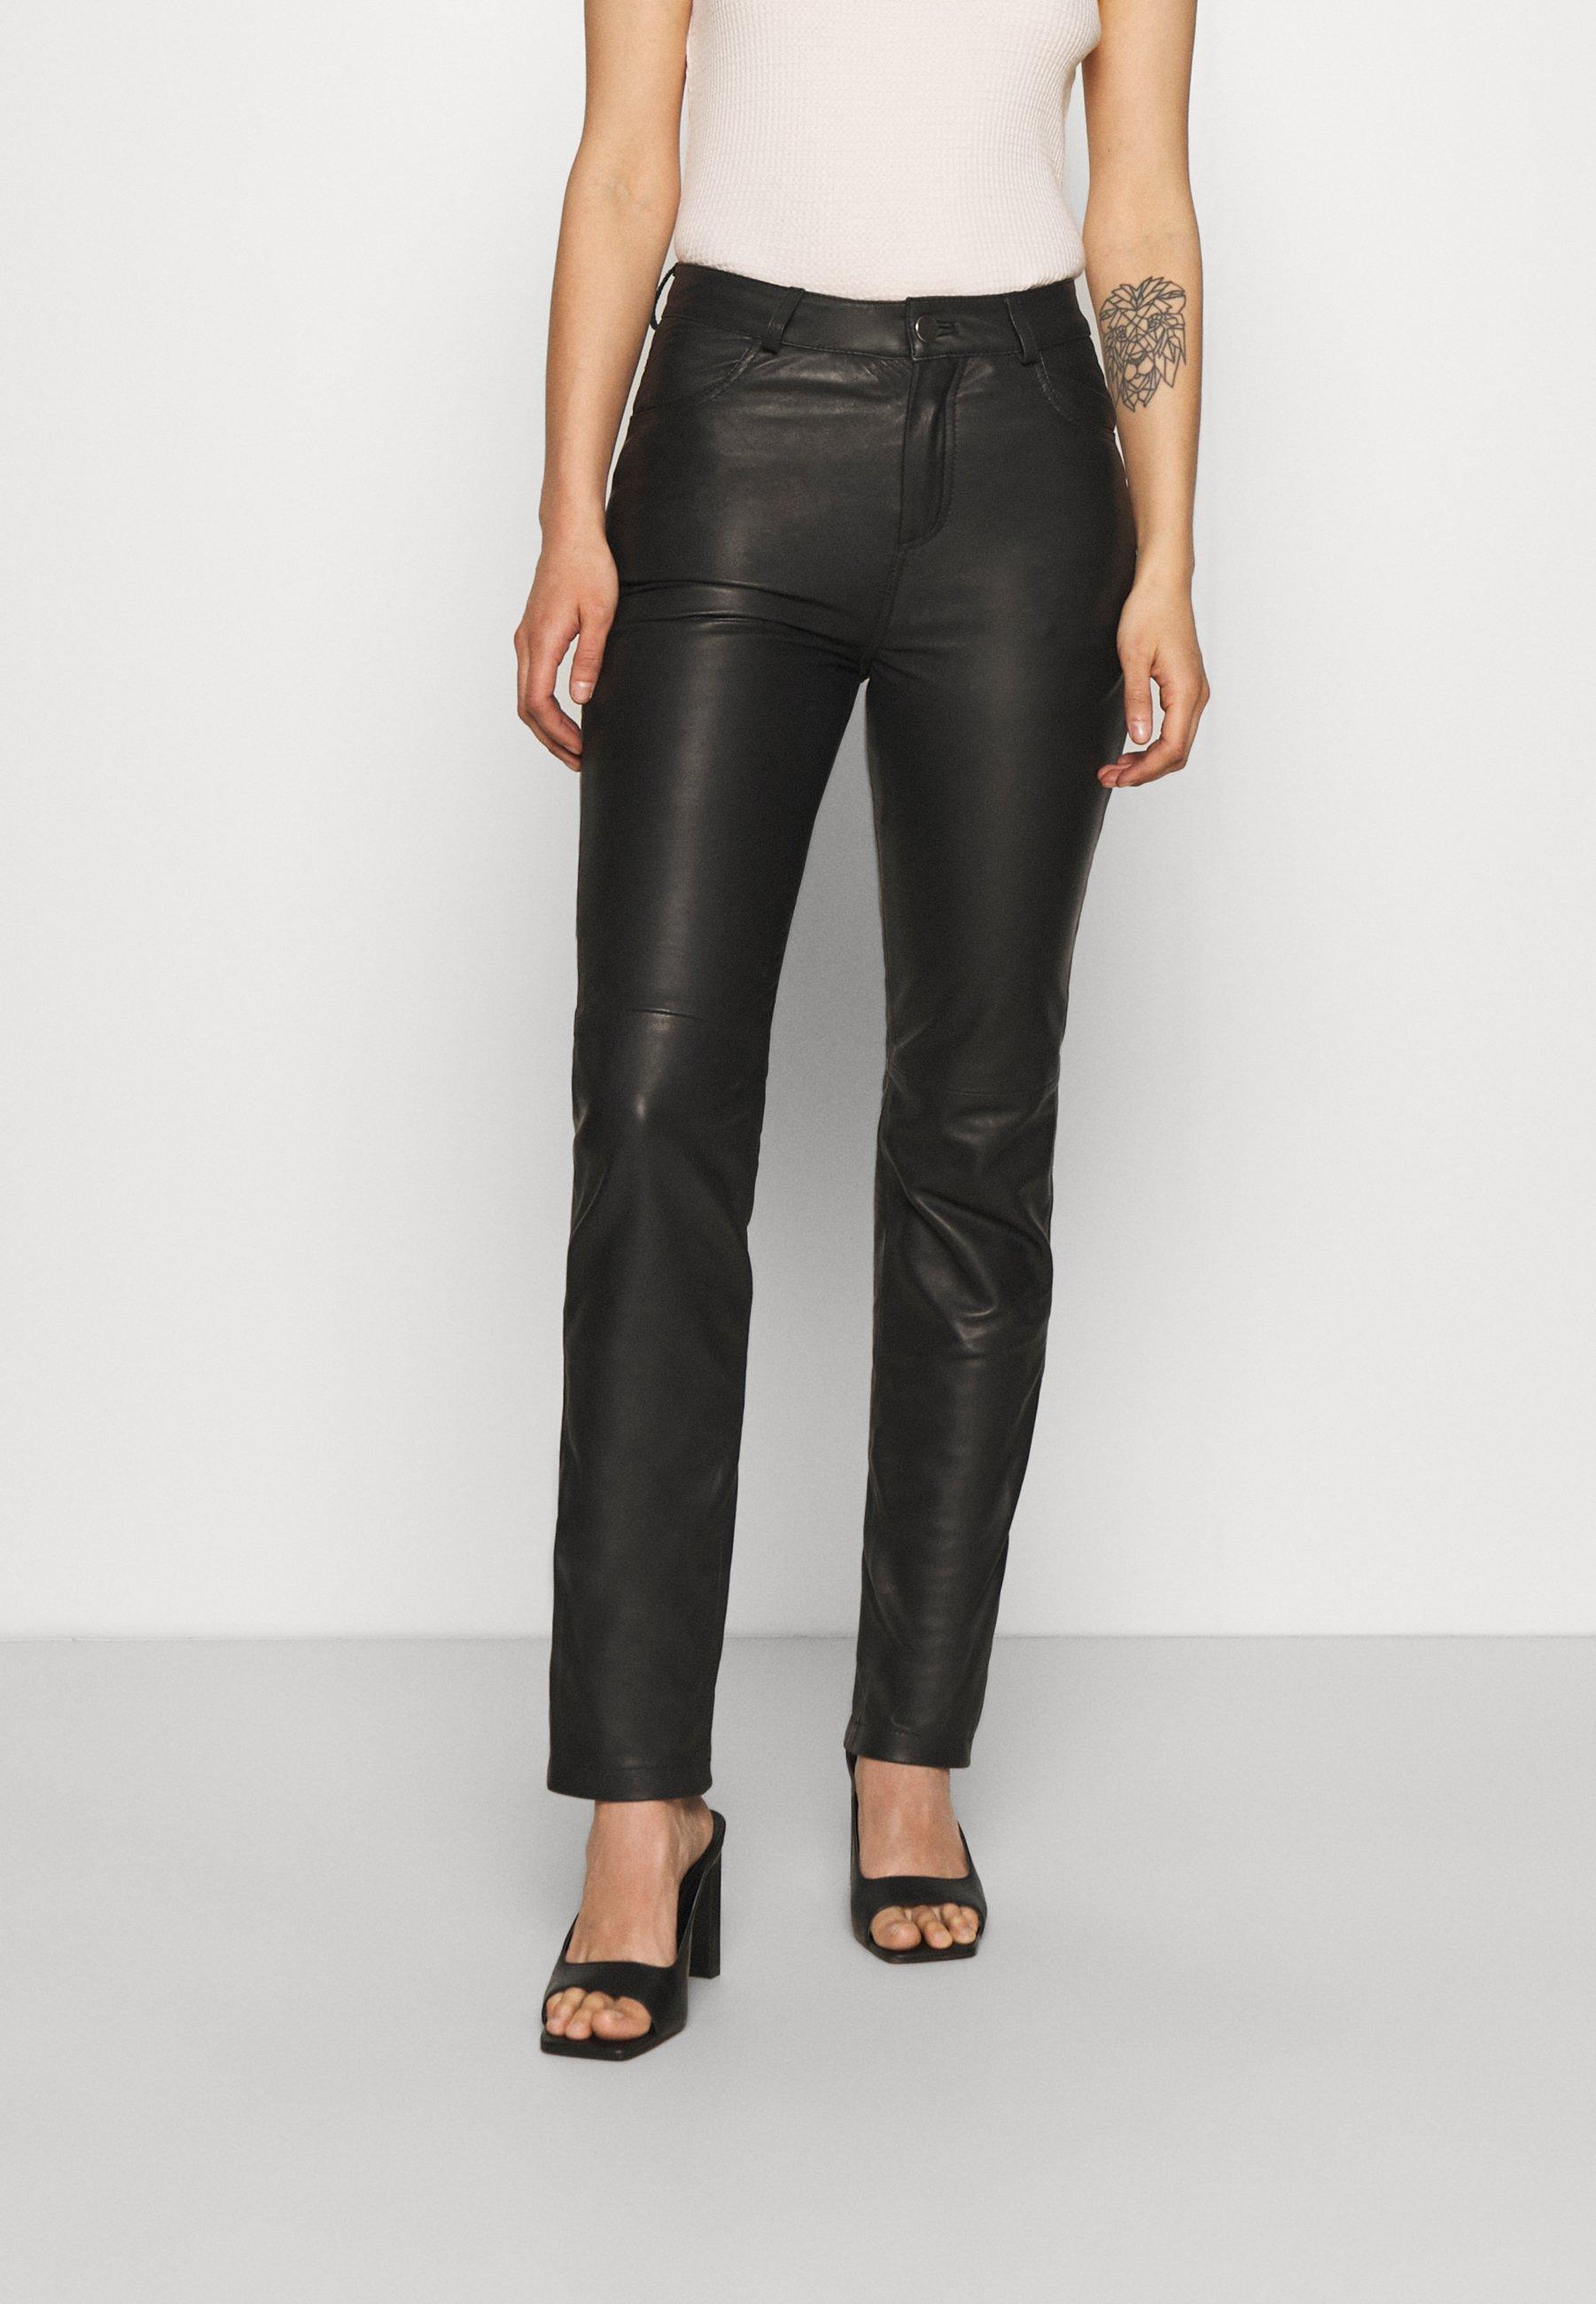 Women PHOENIX PANTS - Leather skirt